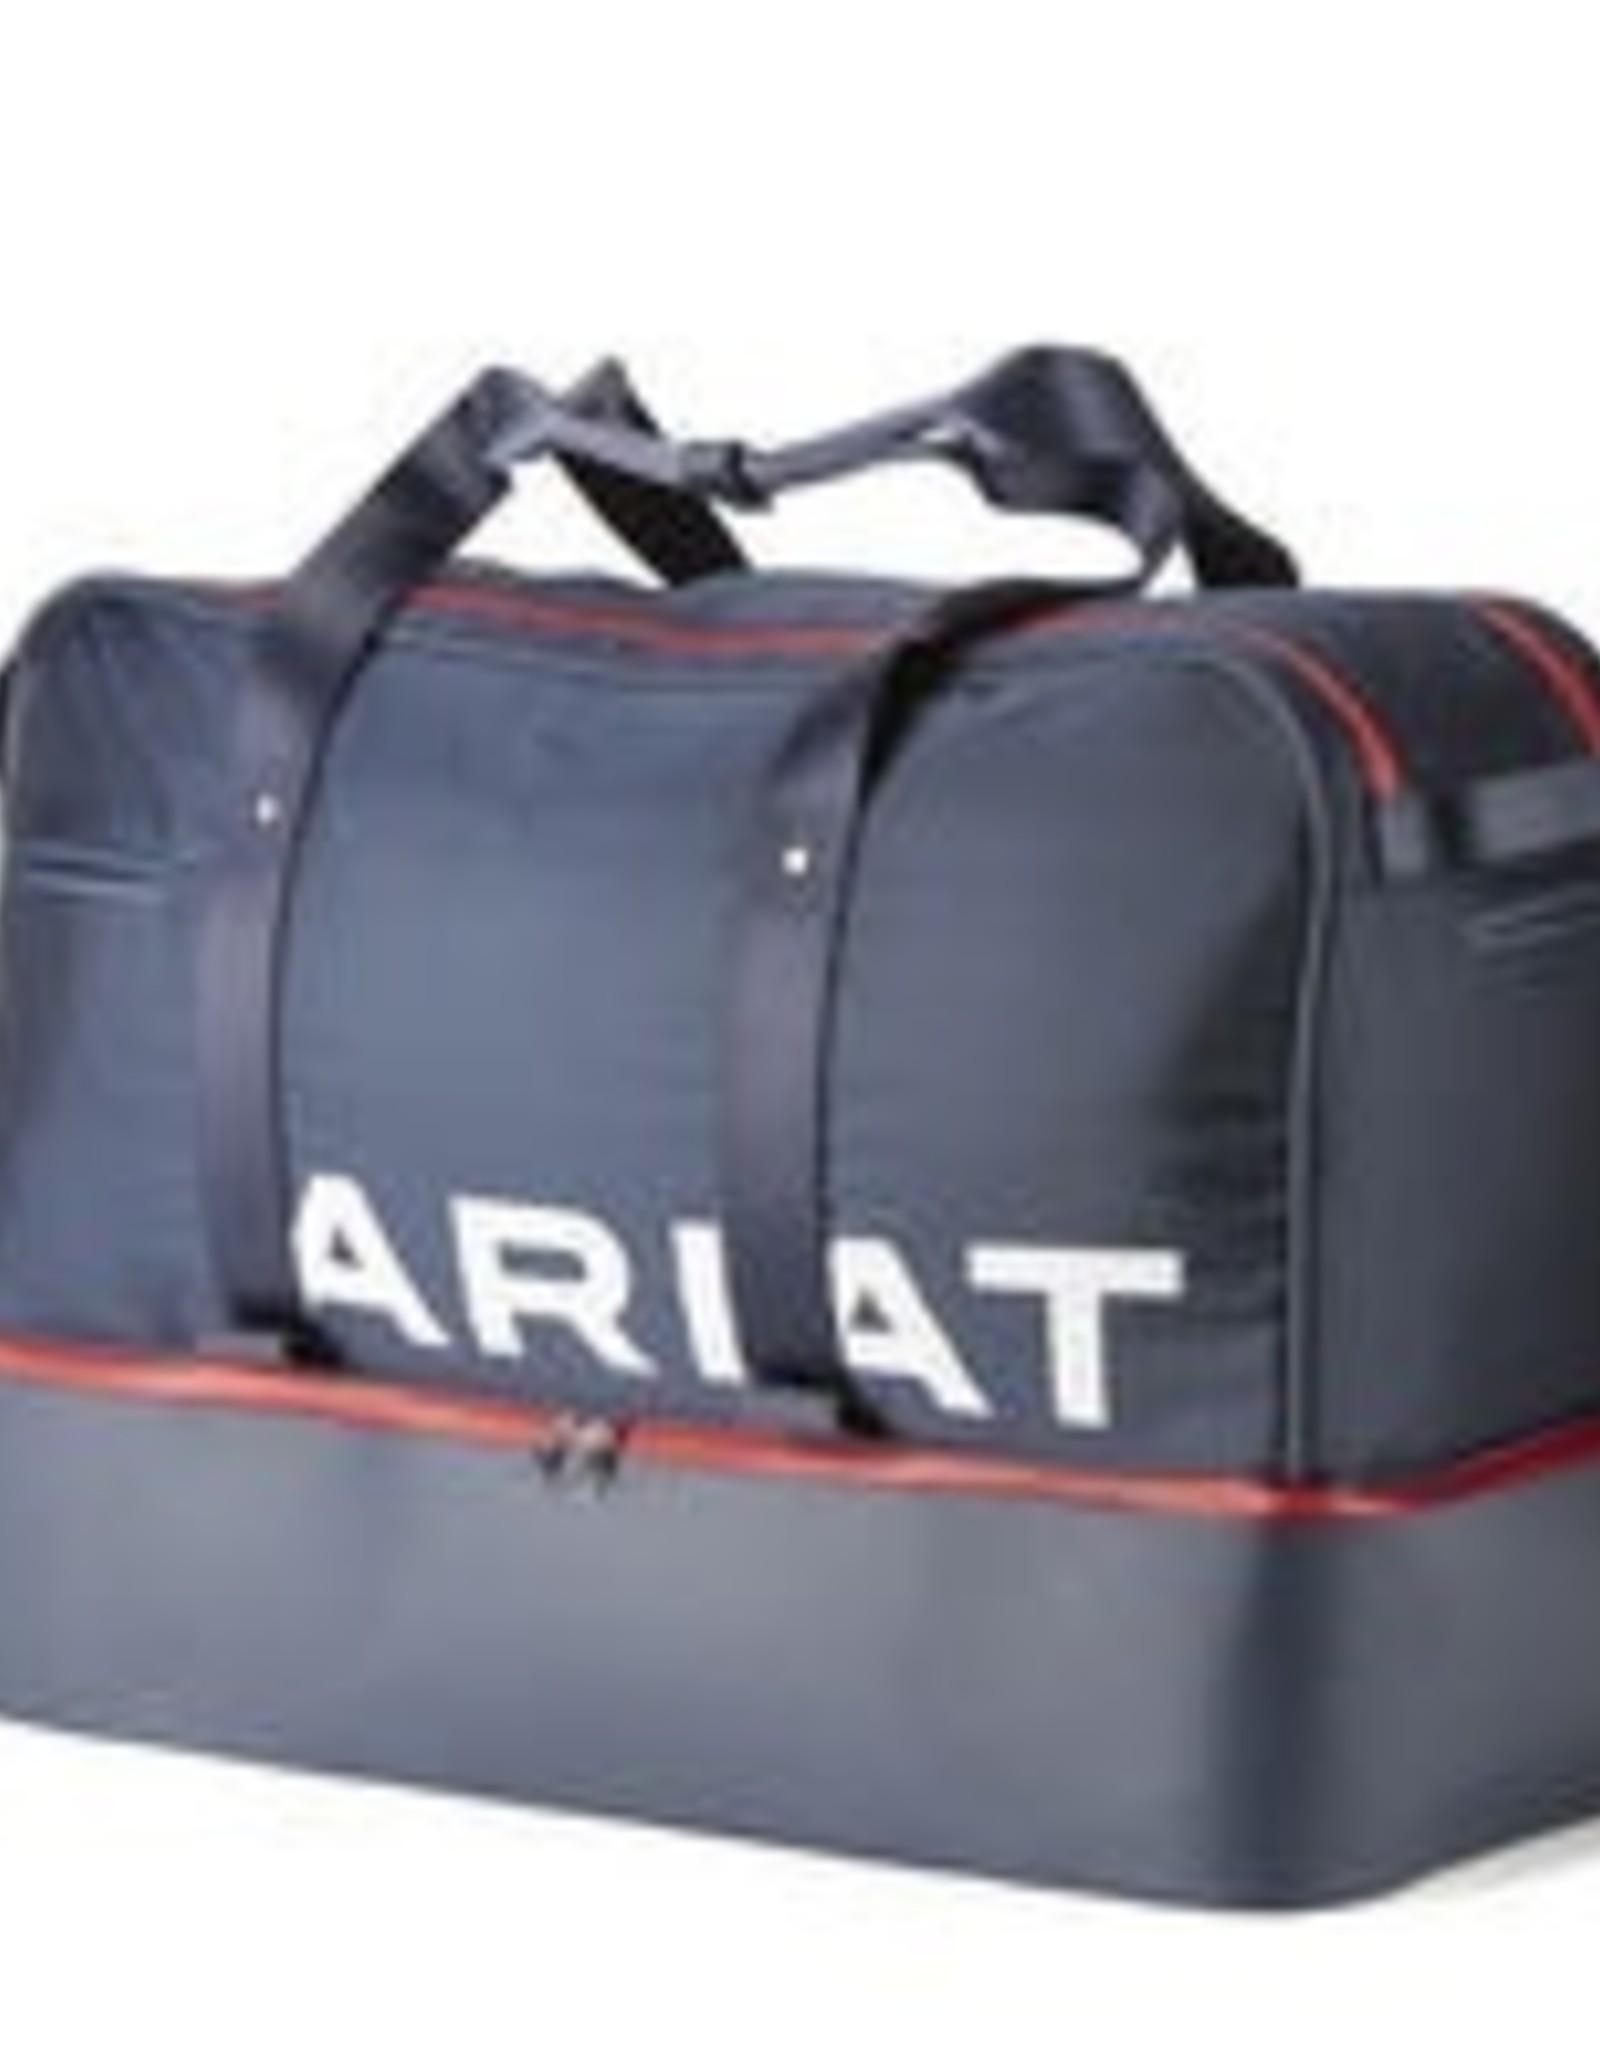 Ariat Grip Bag - Navy/Red